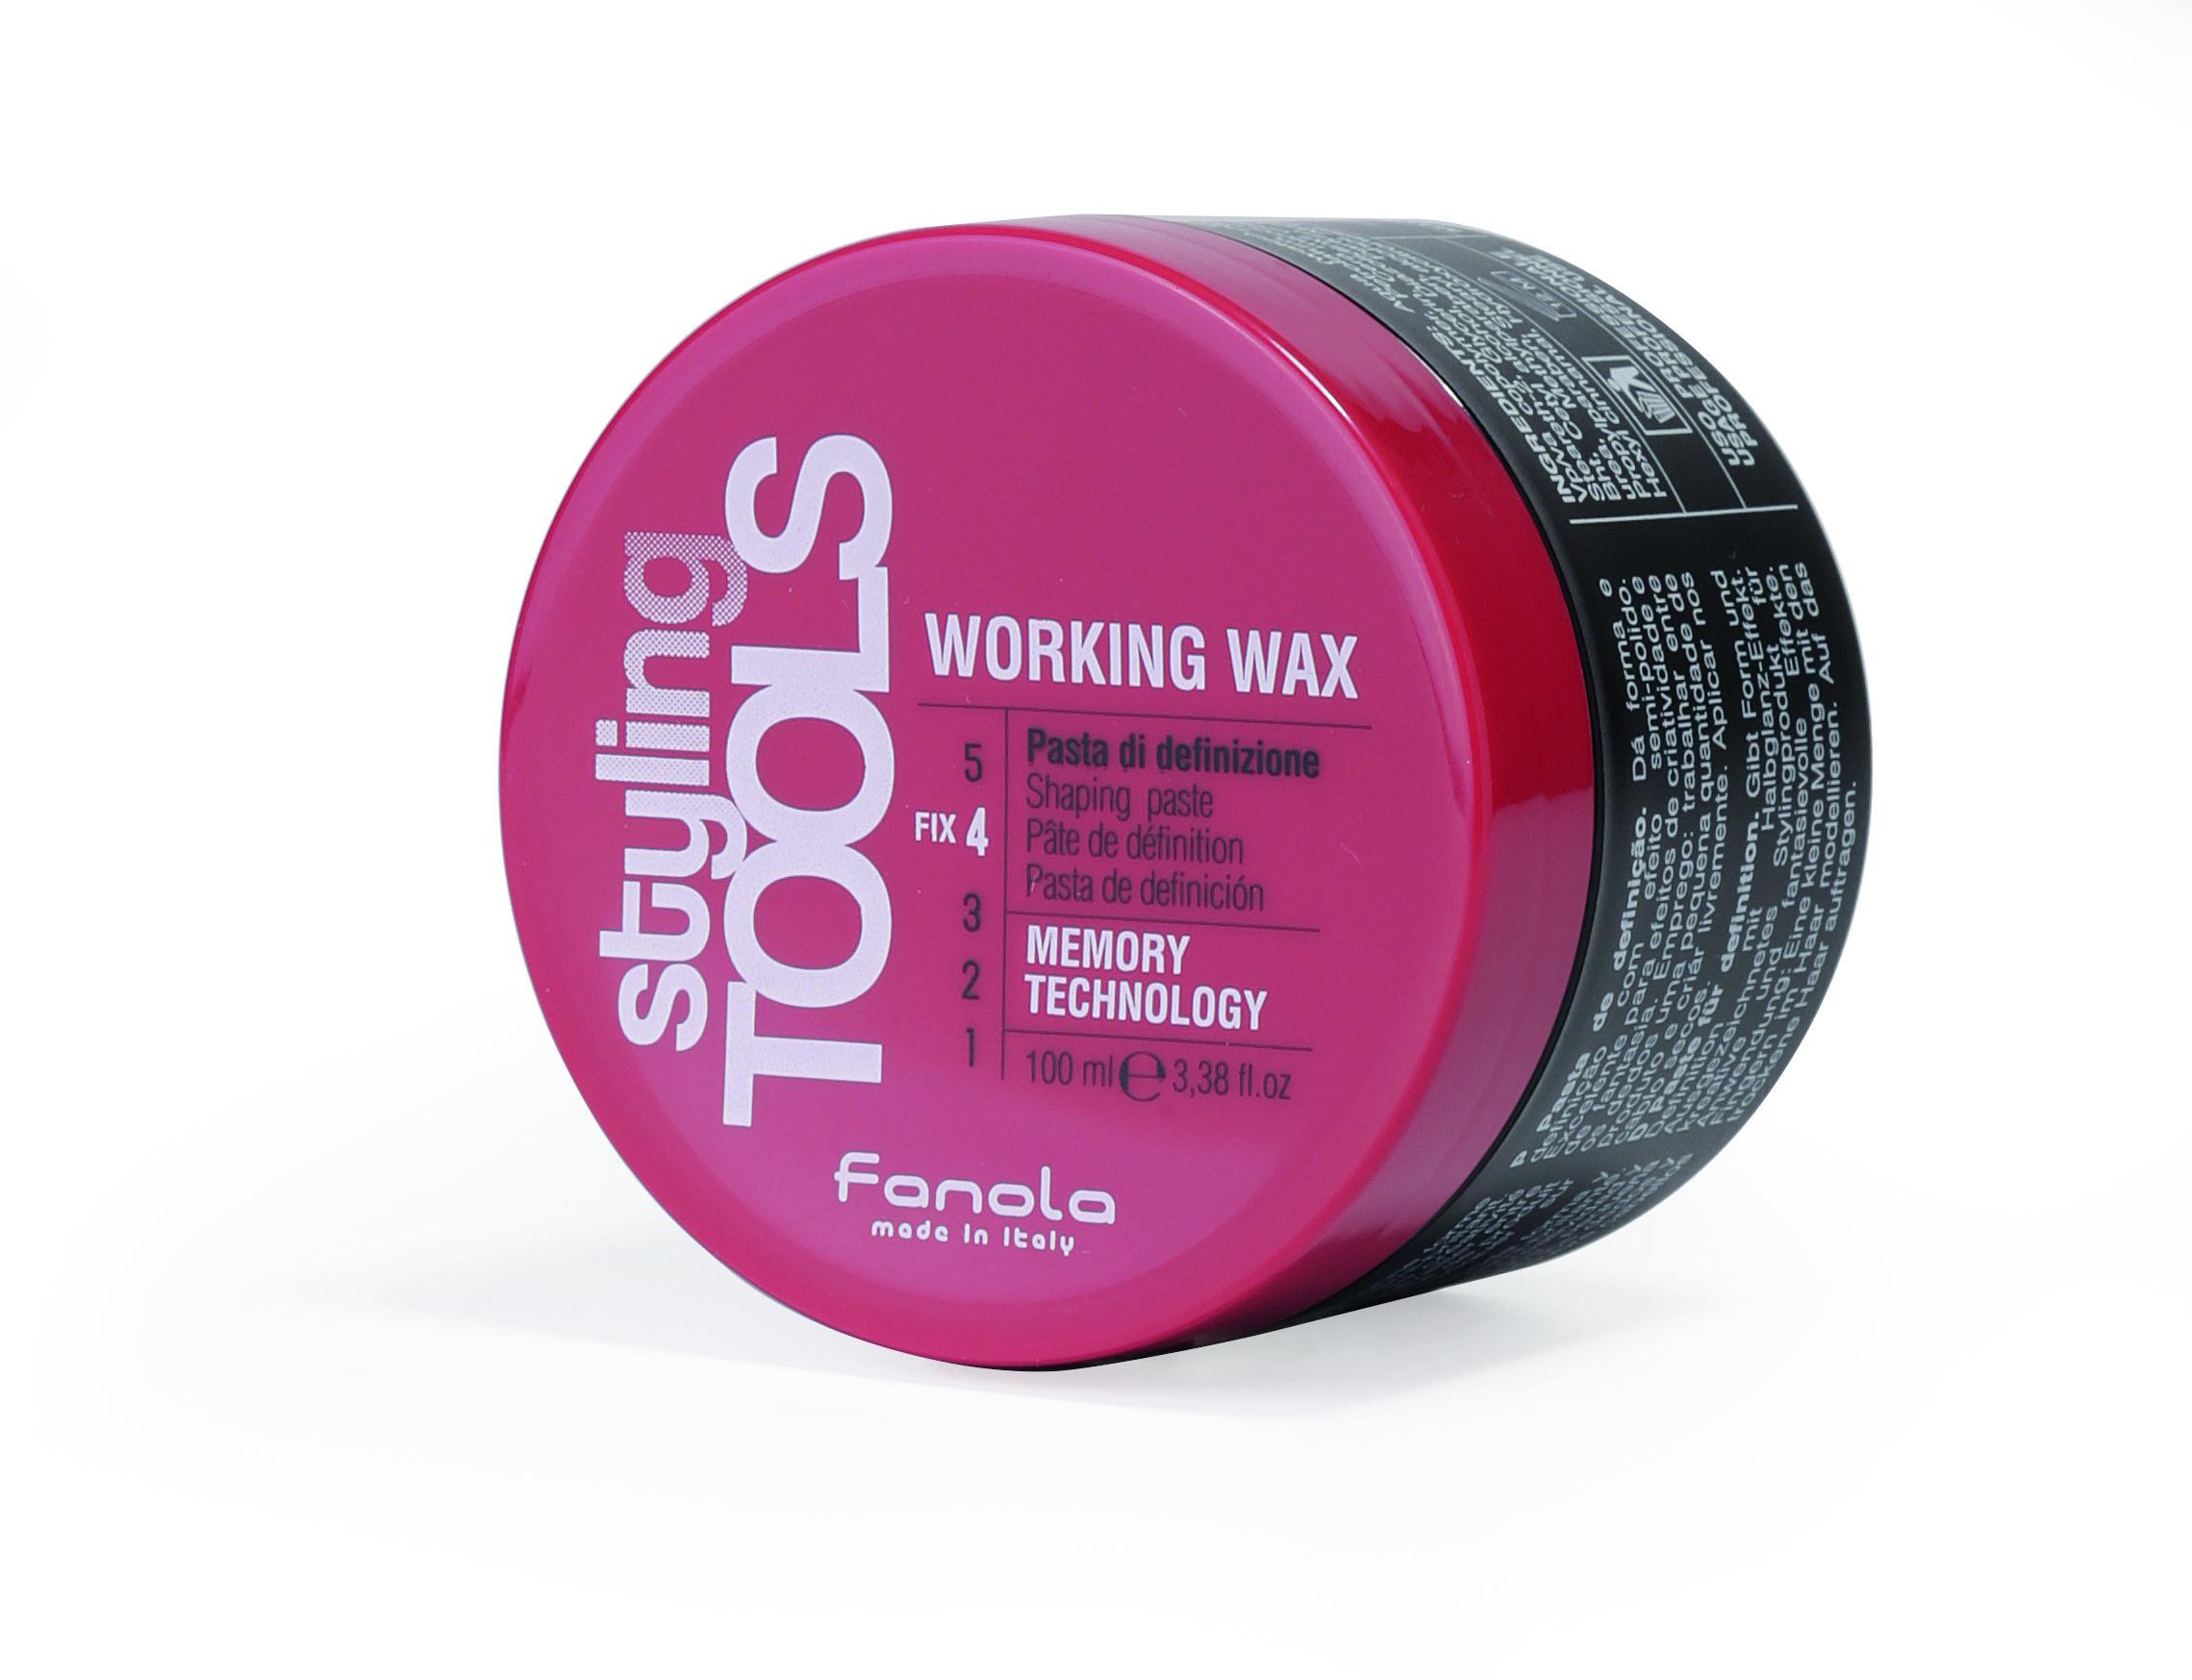 Fanola Styling Tools Working wax - pasta stredne fixačná lesk, 100 ml